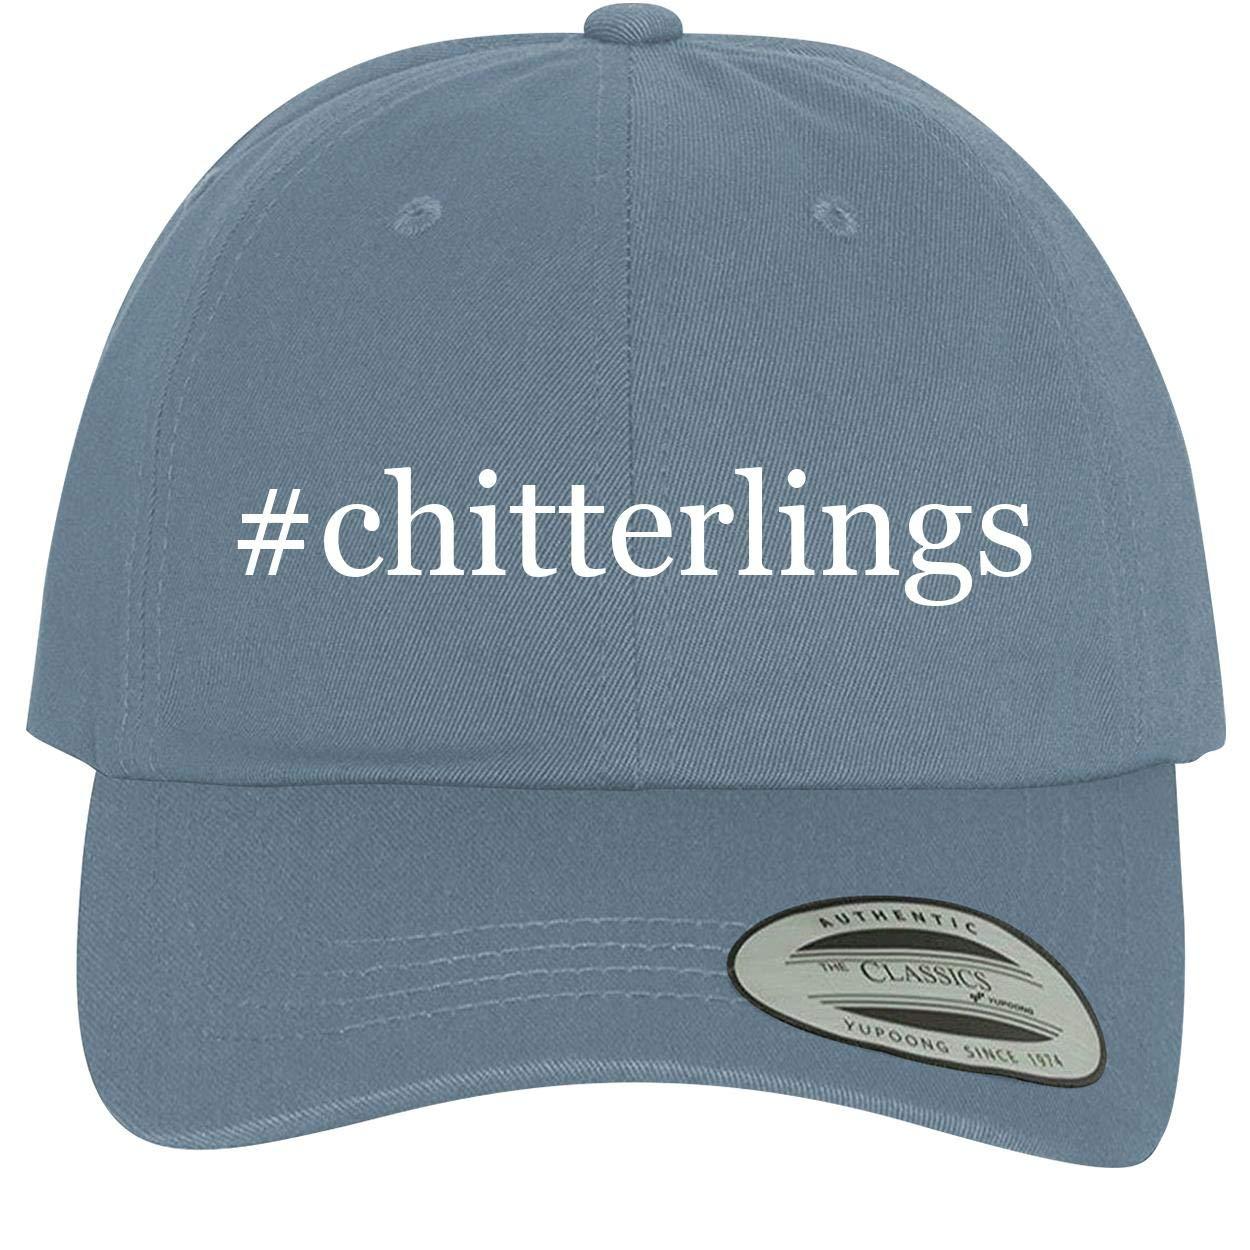 Comfortable Dad Hat Baseball Cap BH Cool Designs #Chitterlings